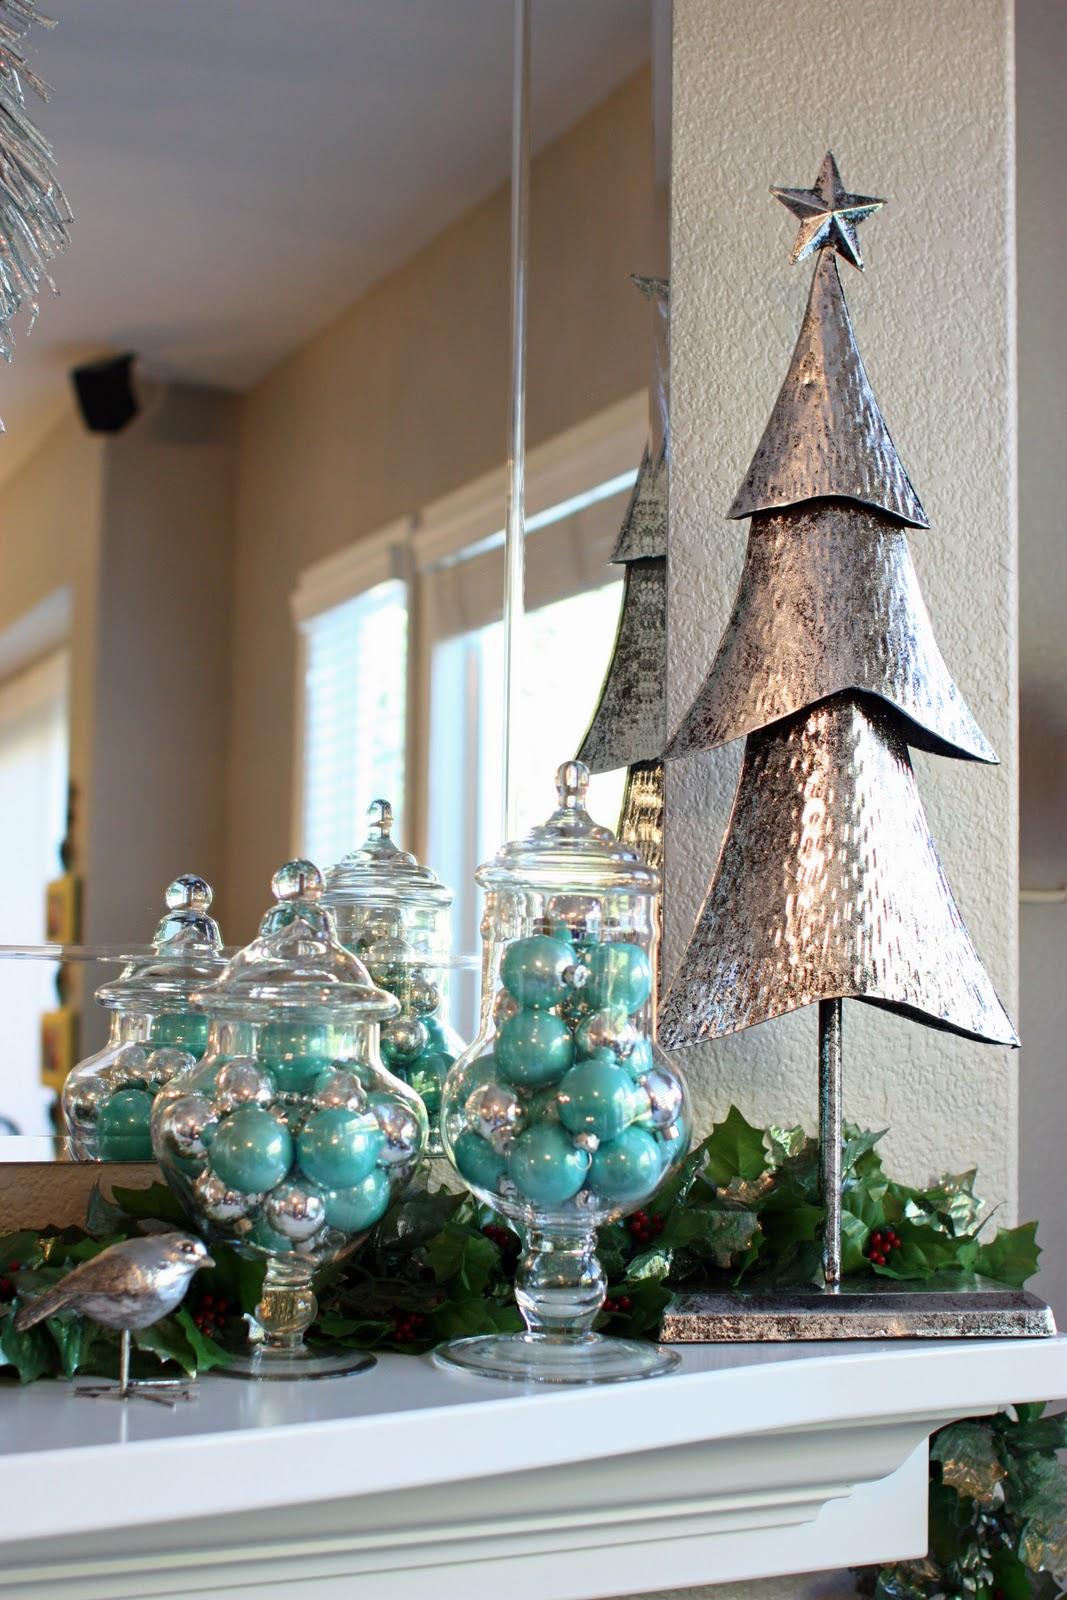 2011 Christmas Mantel - The Sunny Side Up Blog